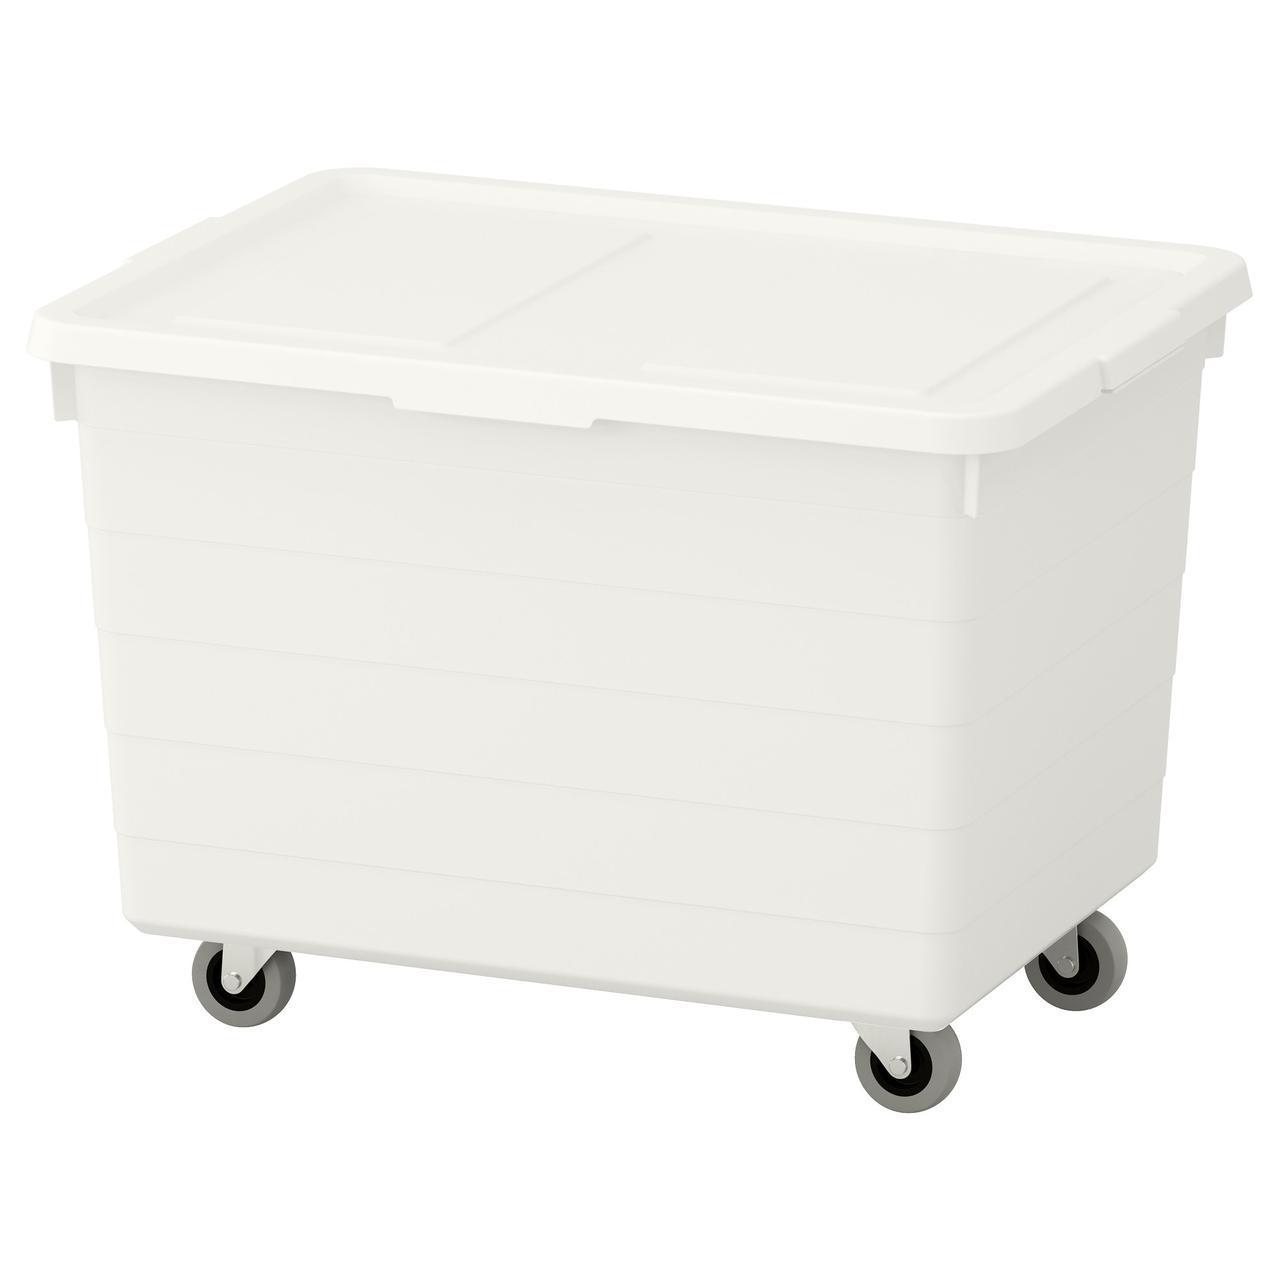 IKEA SOCKERBIT (092.075.72)Коробка на колесах с крышкой, белый